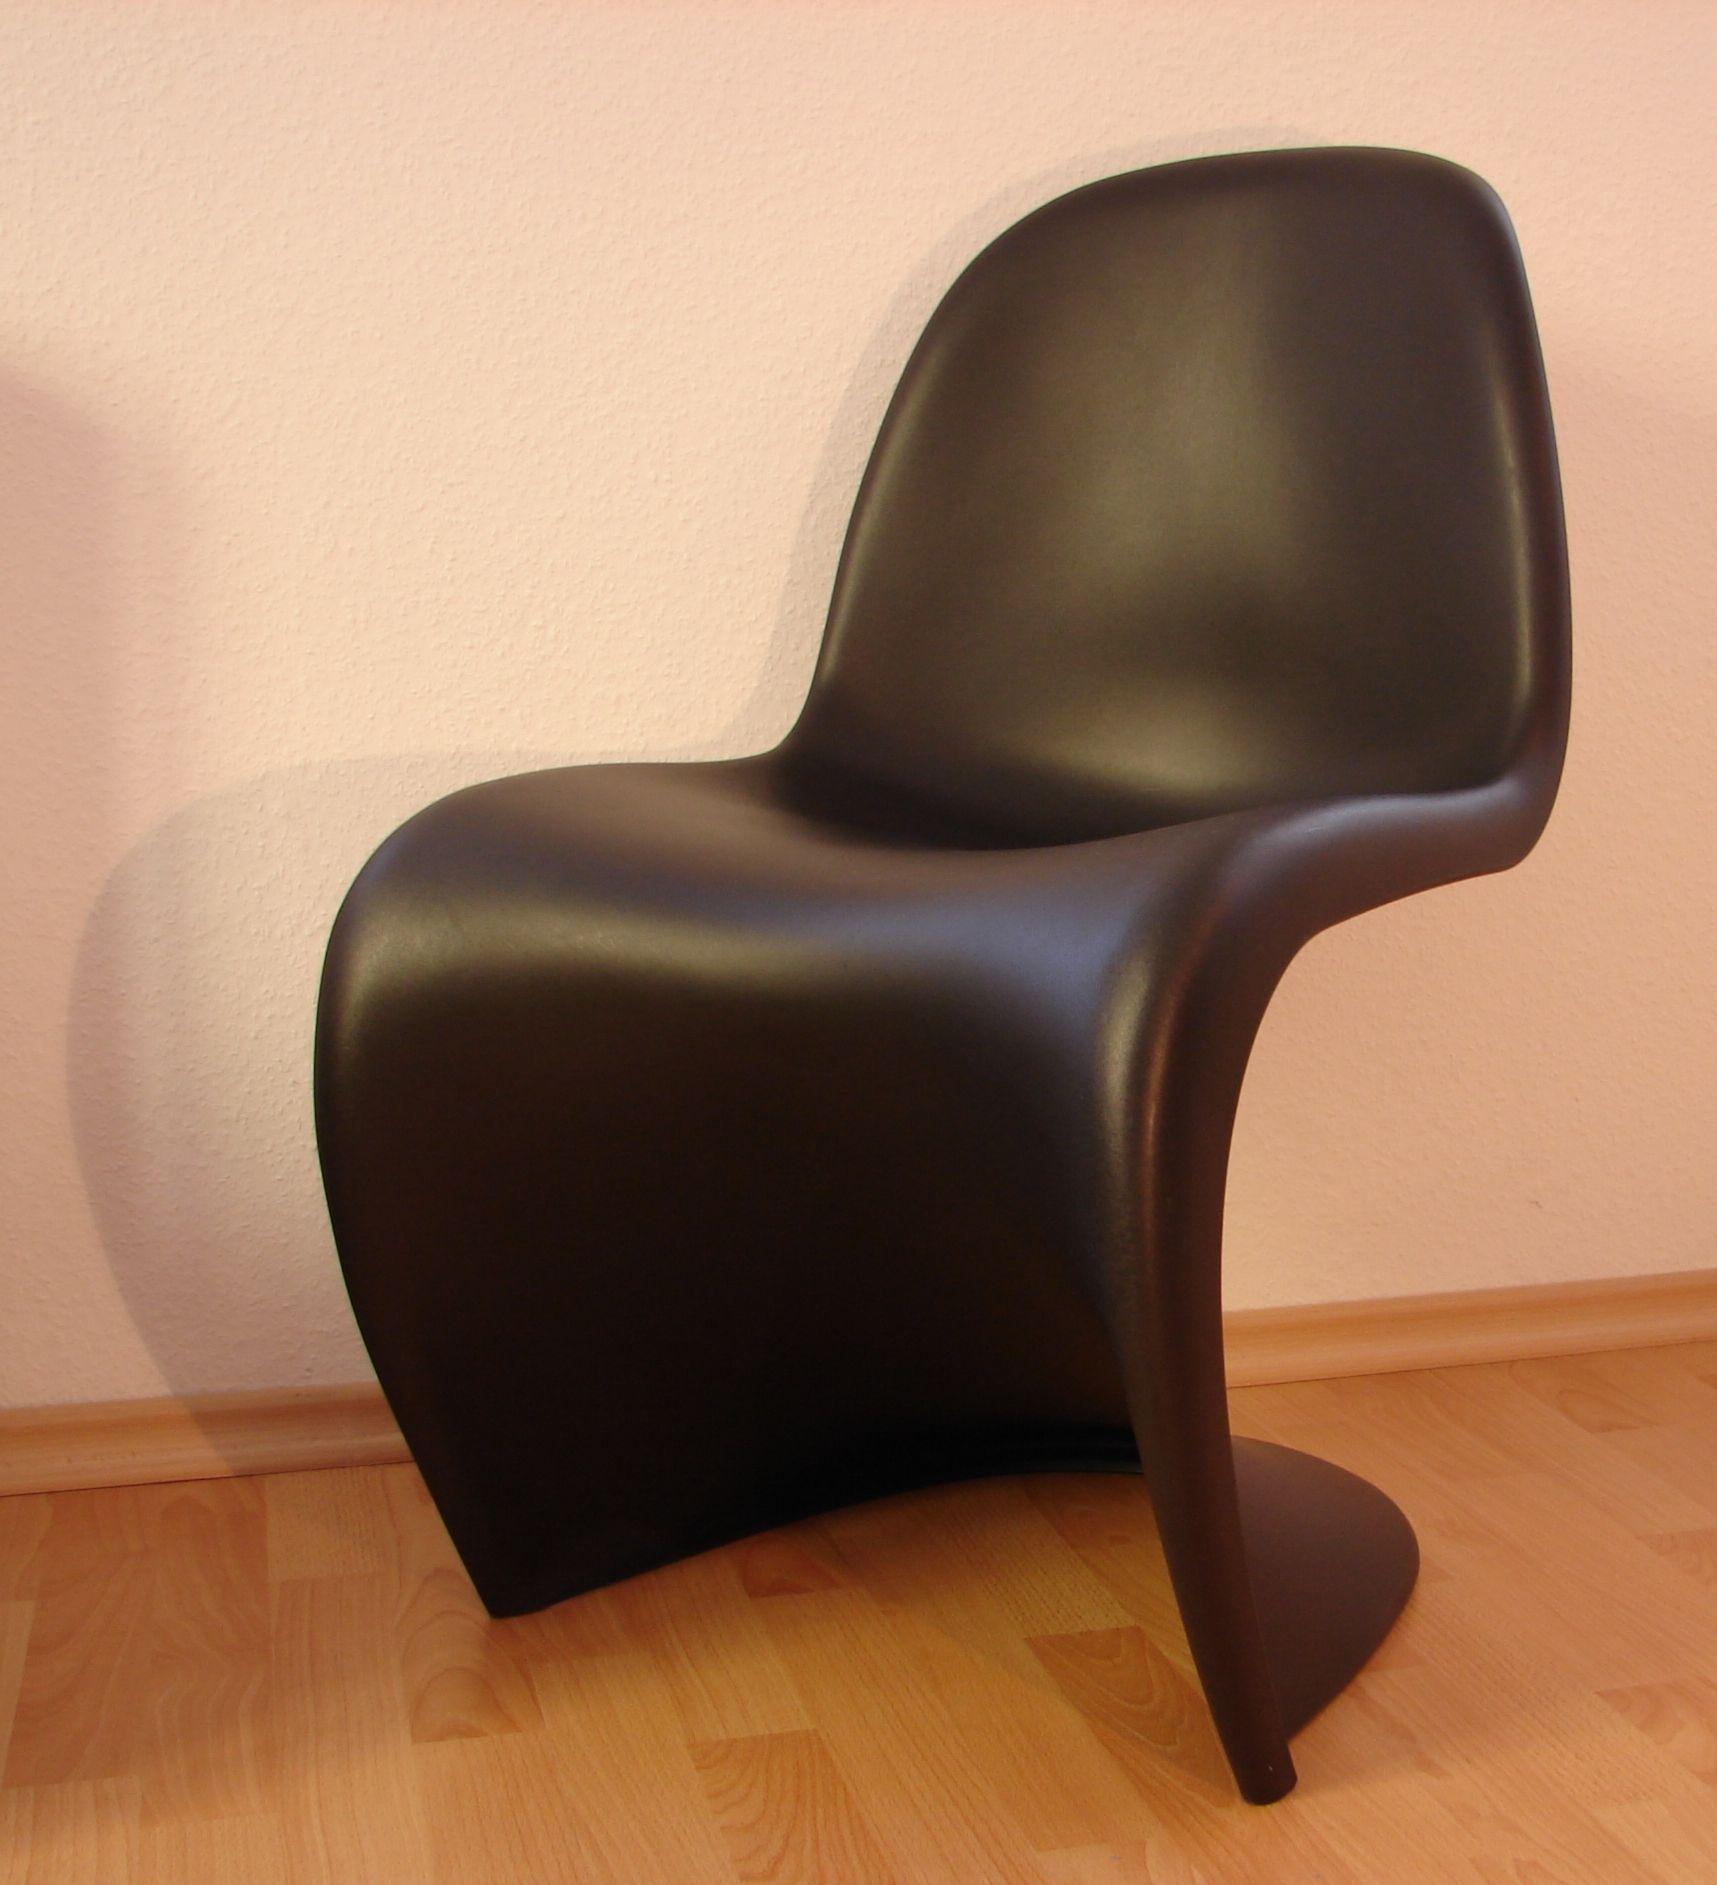 Panton chair verner panton vitra 4x 032007 available